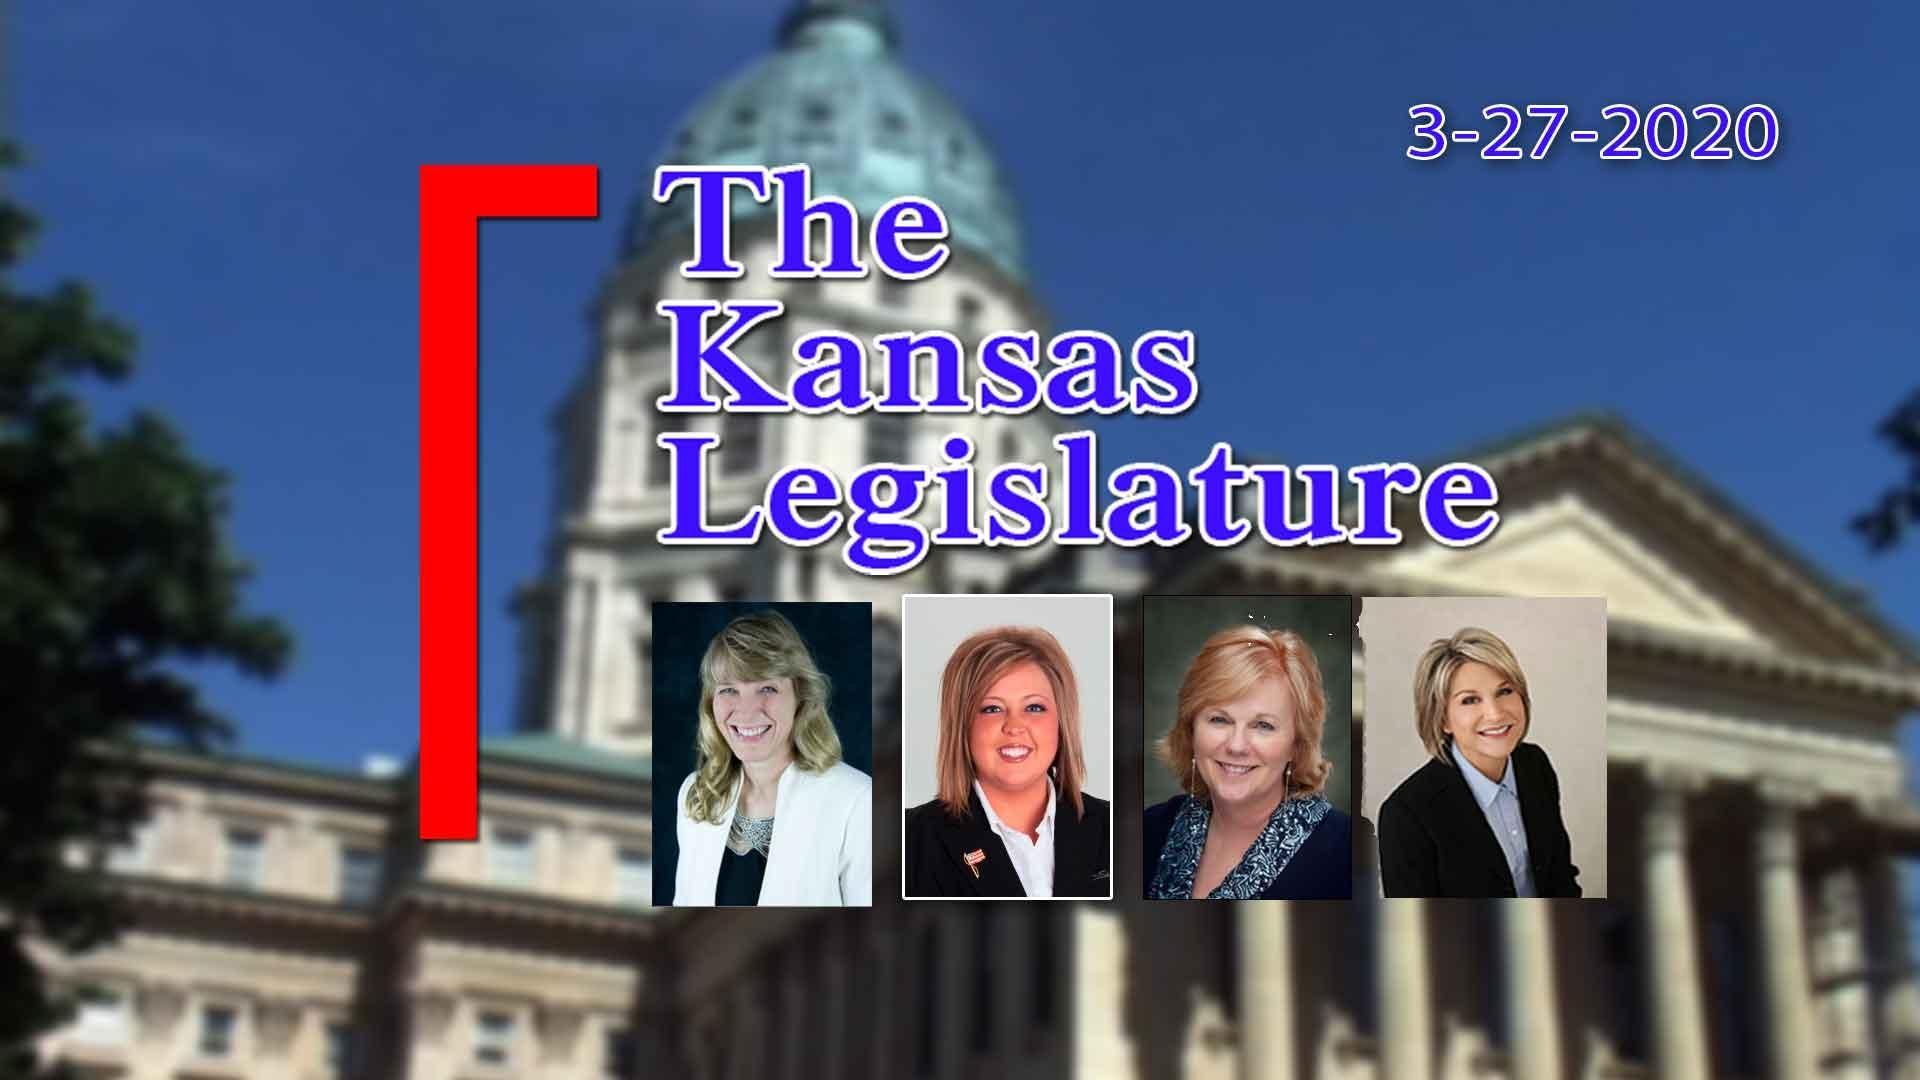 The Kansas Legislature 3-27-2020